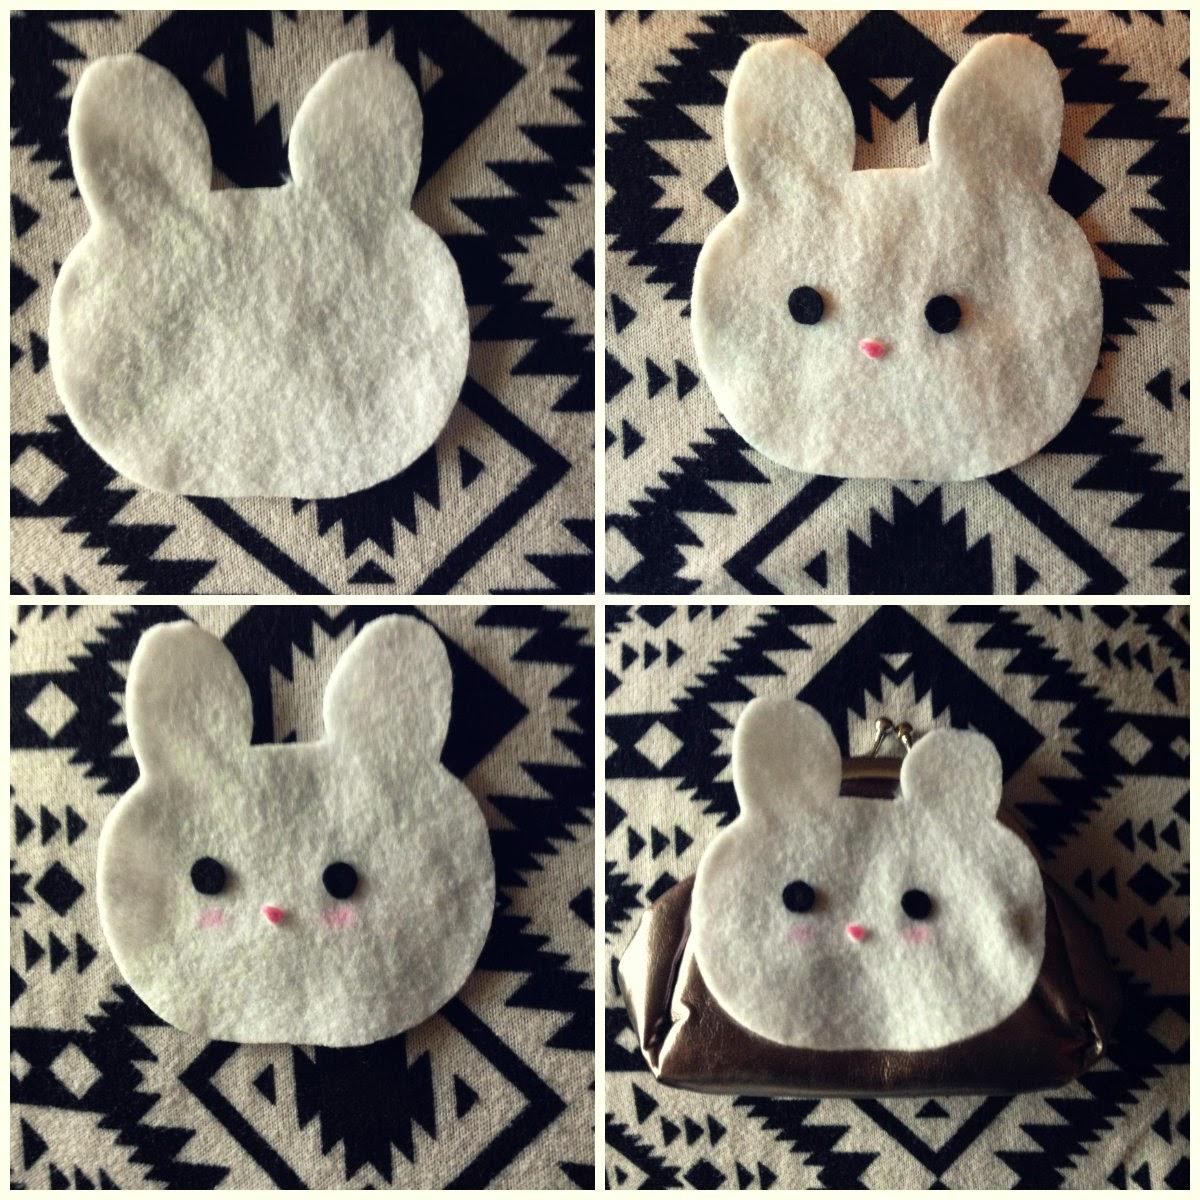 Cute Bunny Coin Purse DIY